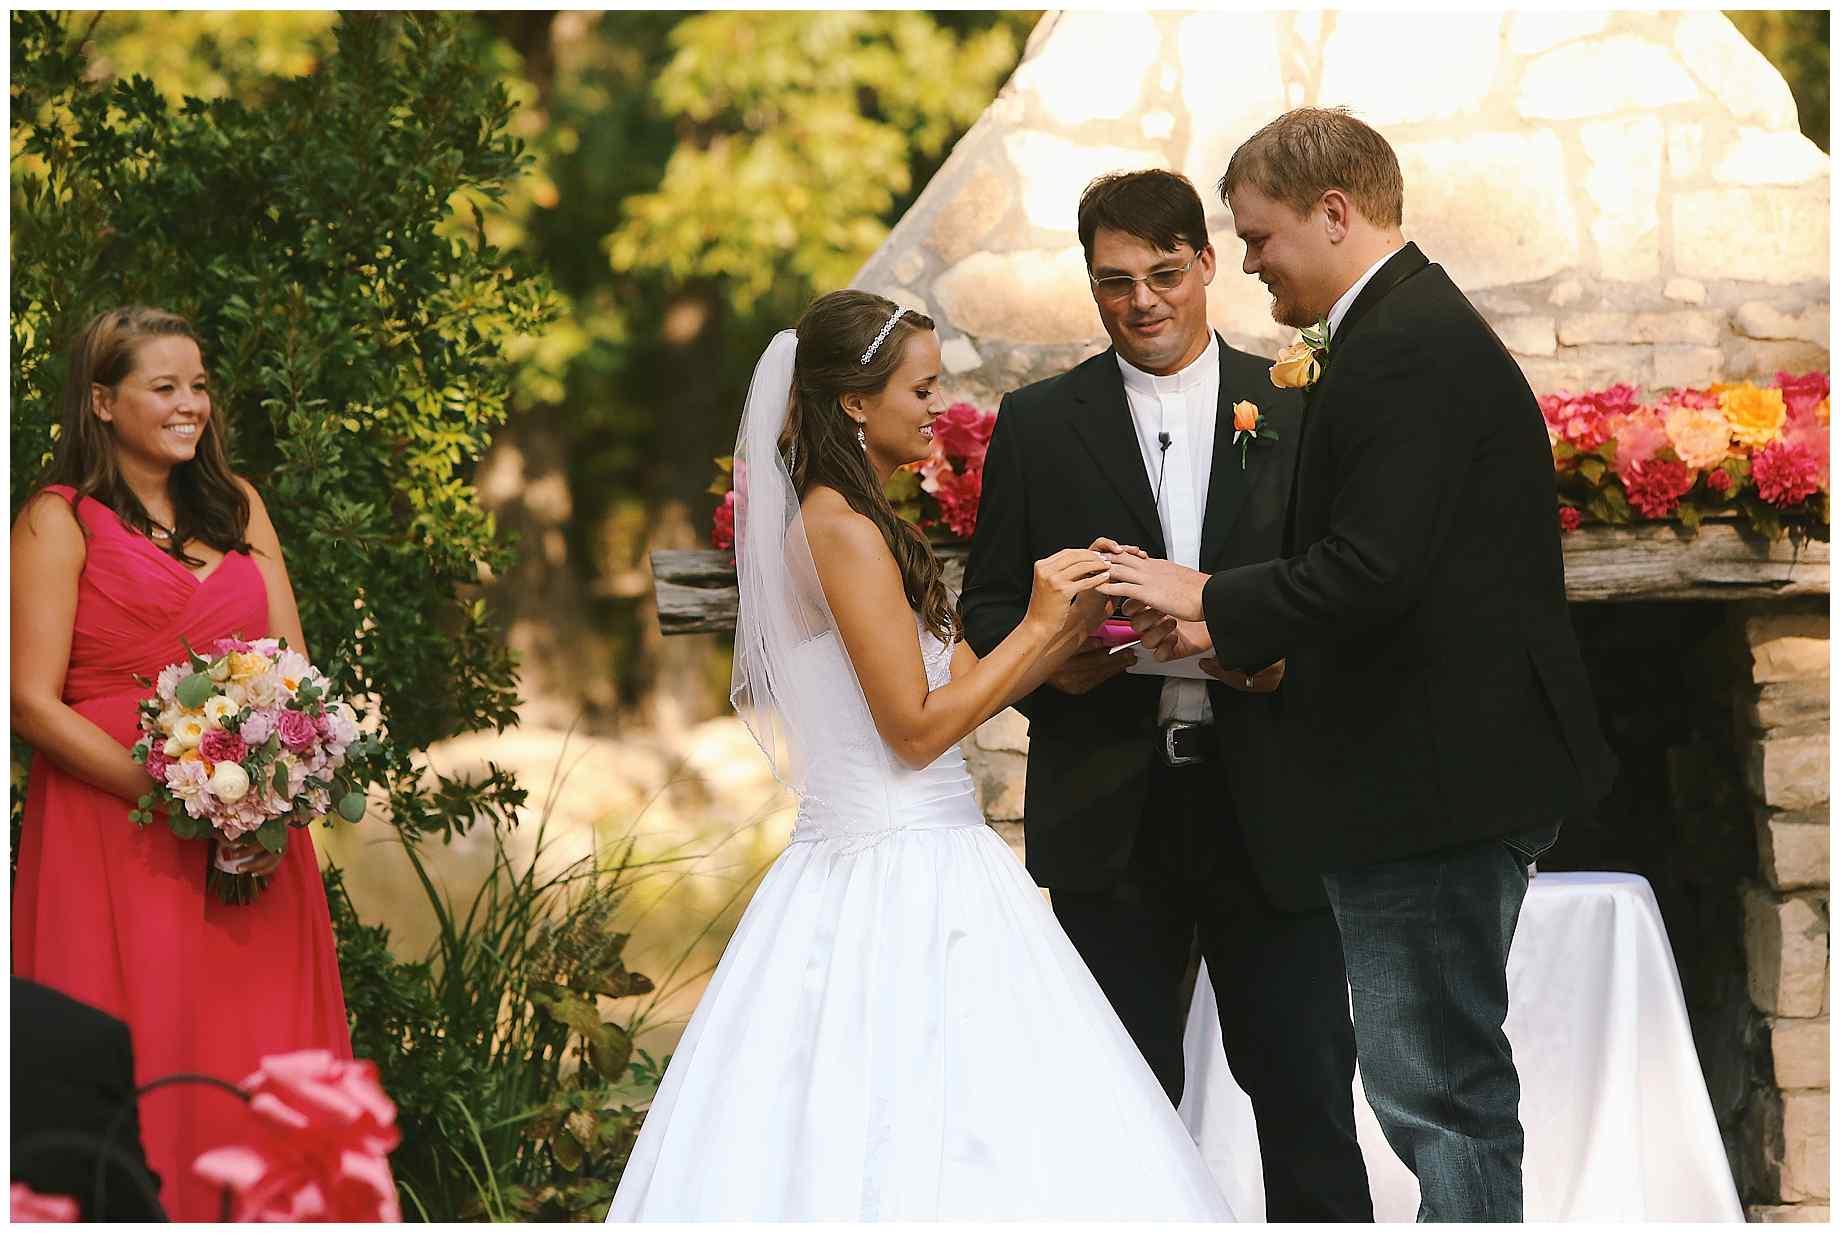 pecan-springs-ranch-austin-tx-wedding-016